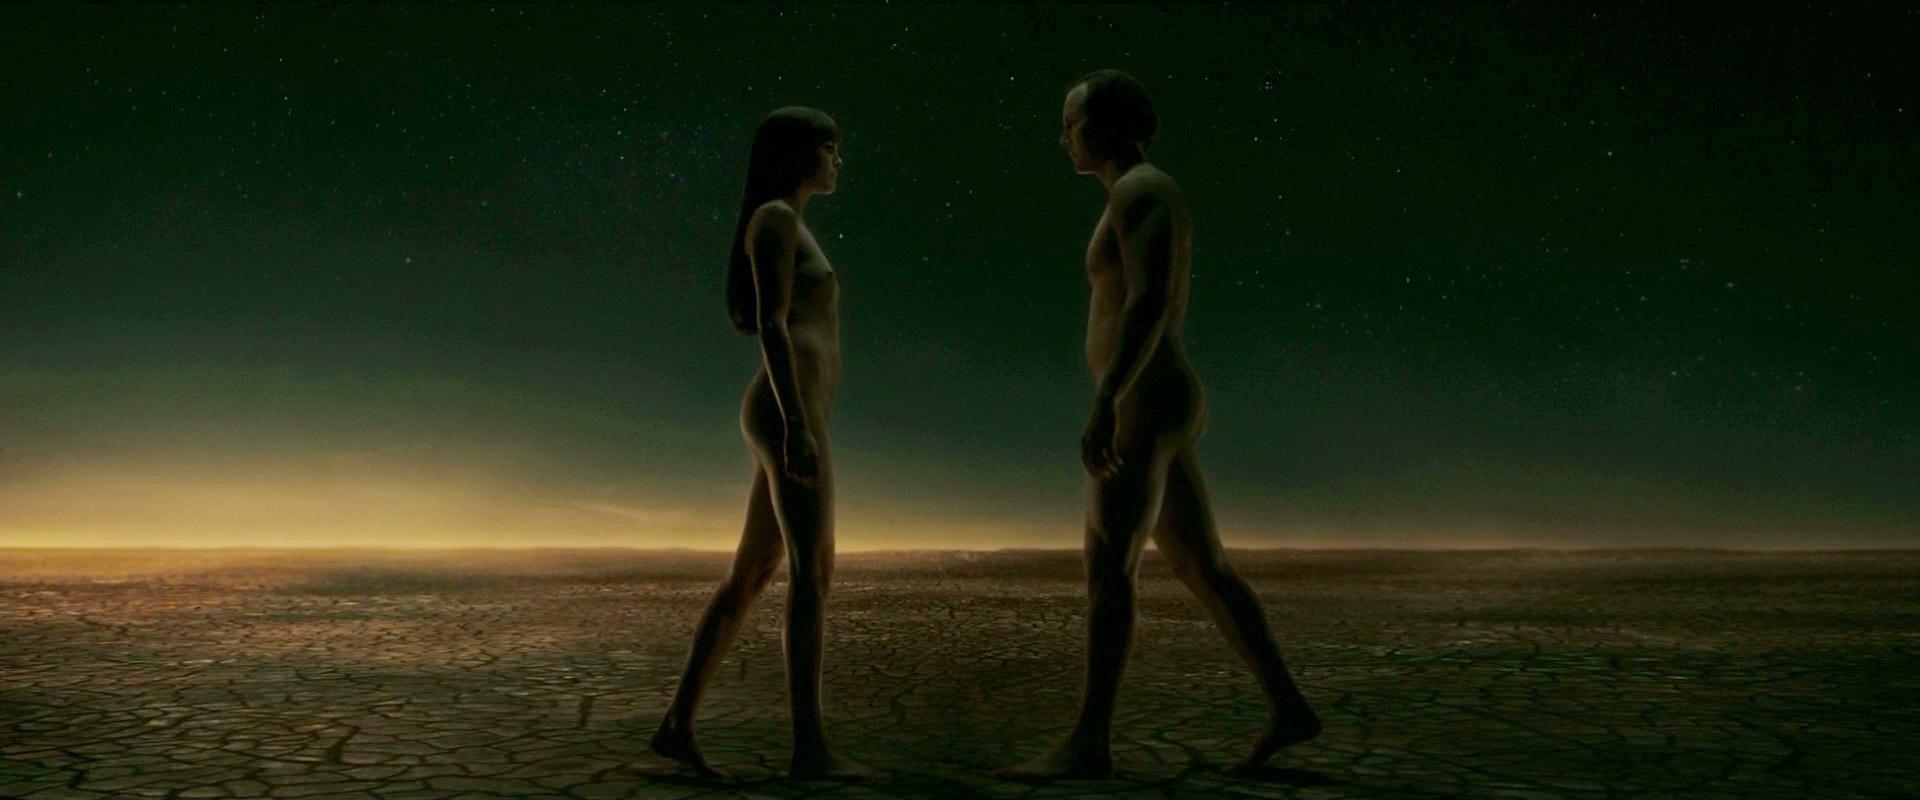 Malin akerman nude watchmen